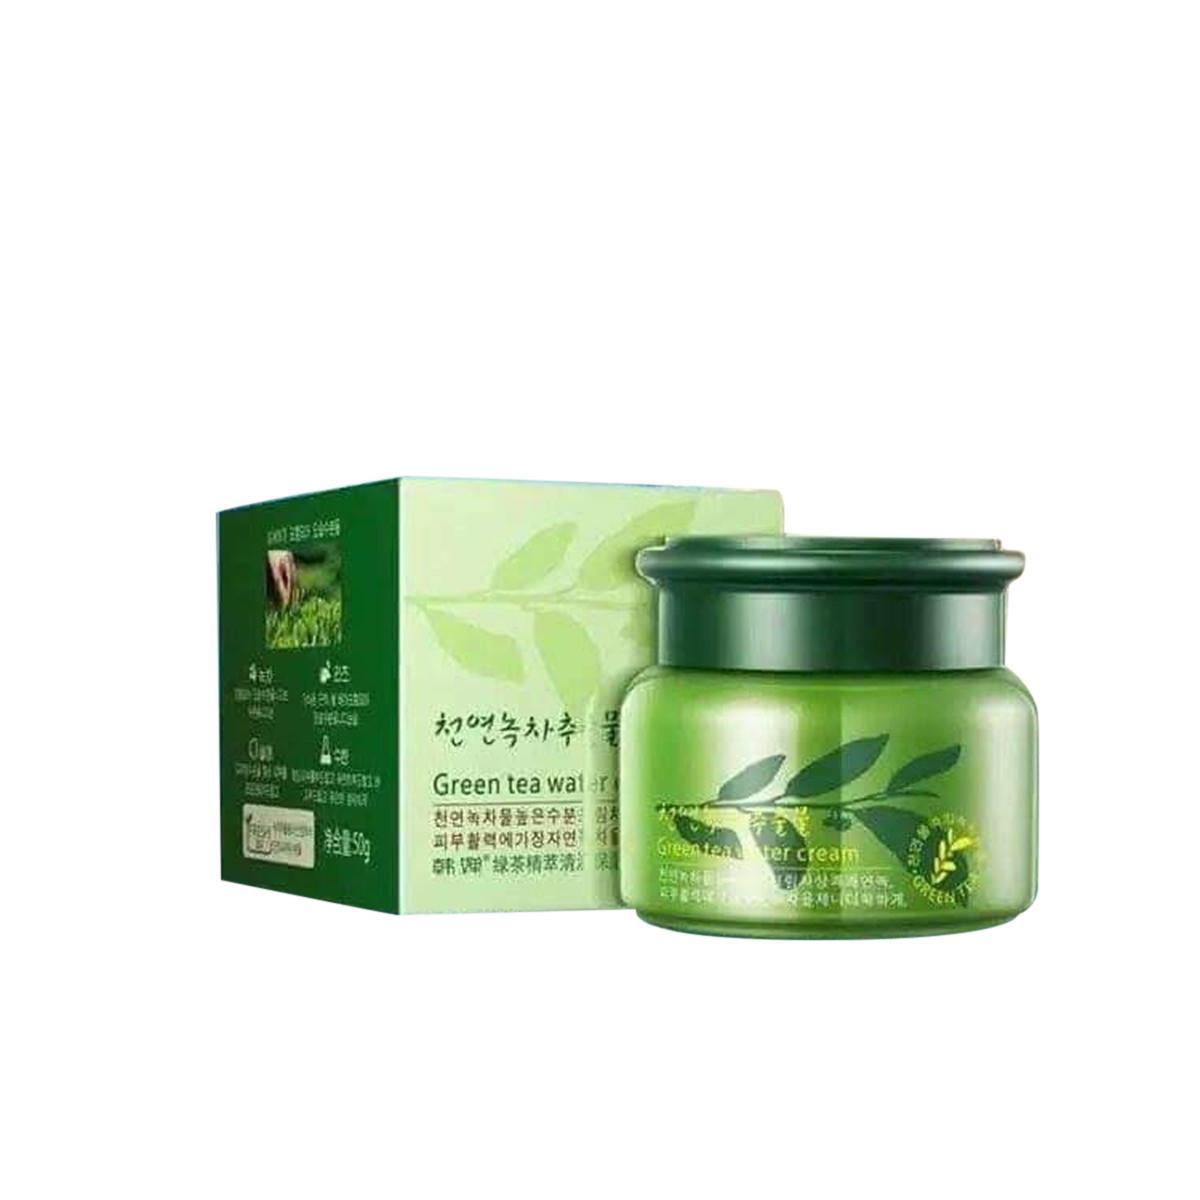 Anmolrorec Buy At Best Price In Bangladesh Www Rorec Natural Skin Care Pomegranate Green Tea Water Essence Moisturiser 50gm